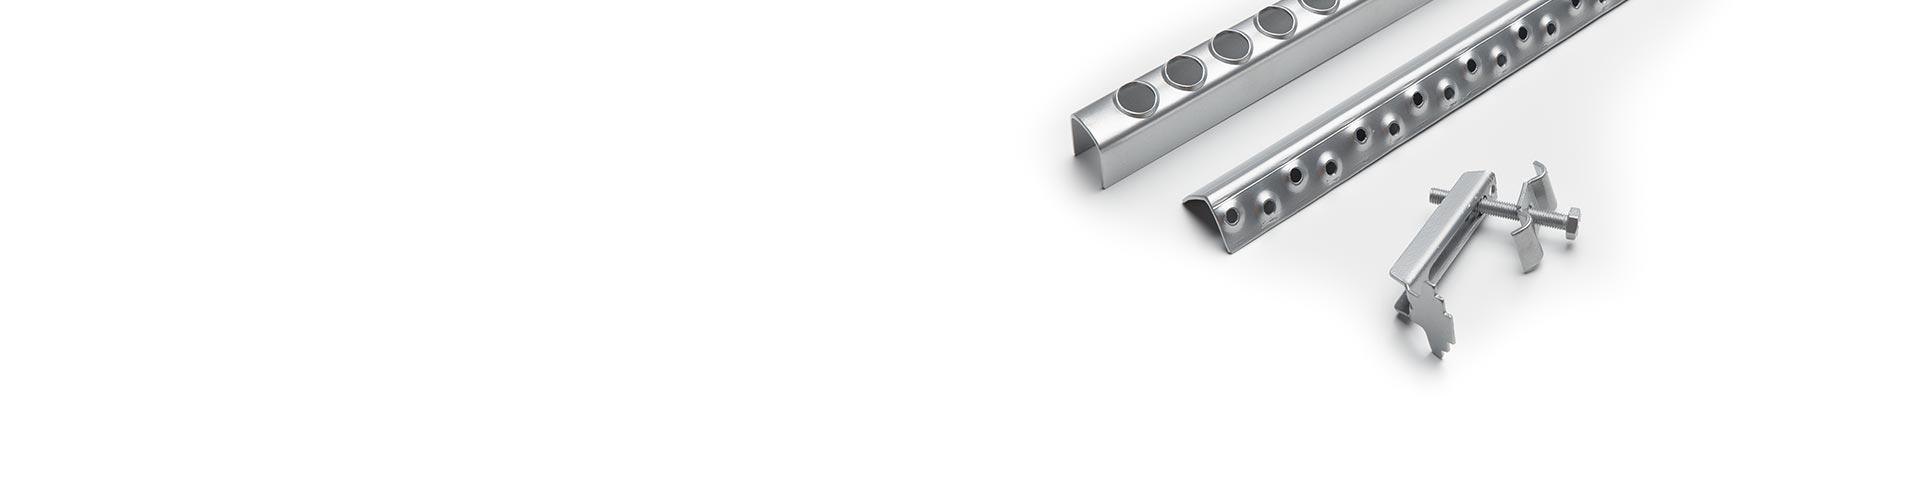 Zubehör Stahlbodenroste - perfolinea.de